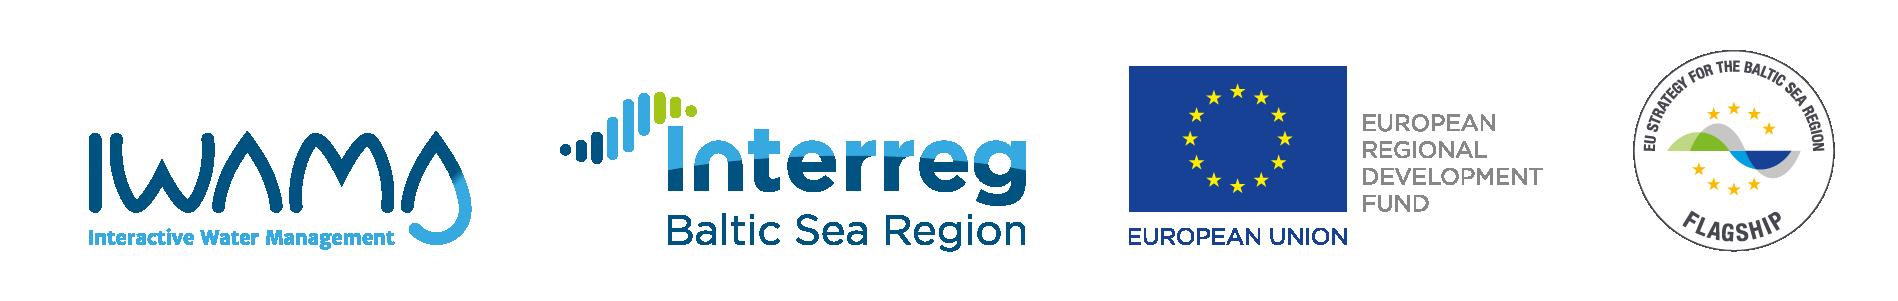 IWAMA project, Interreg BSR and EU flag